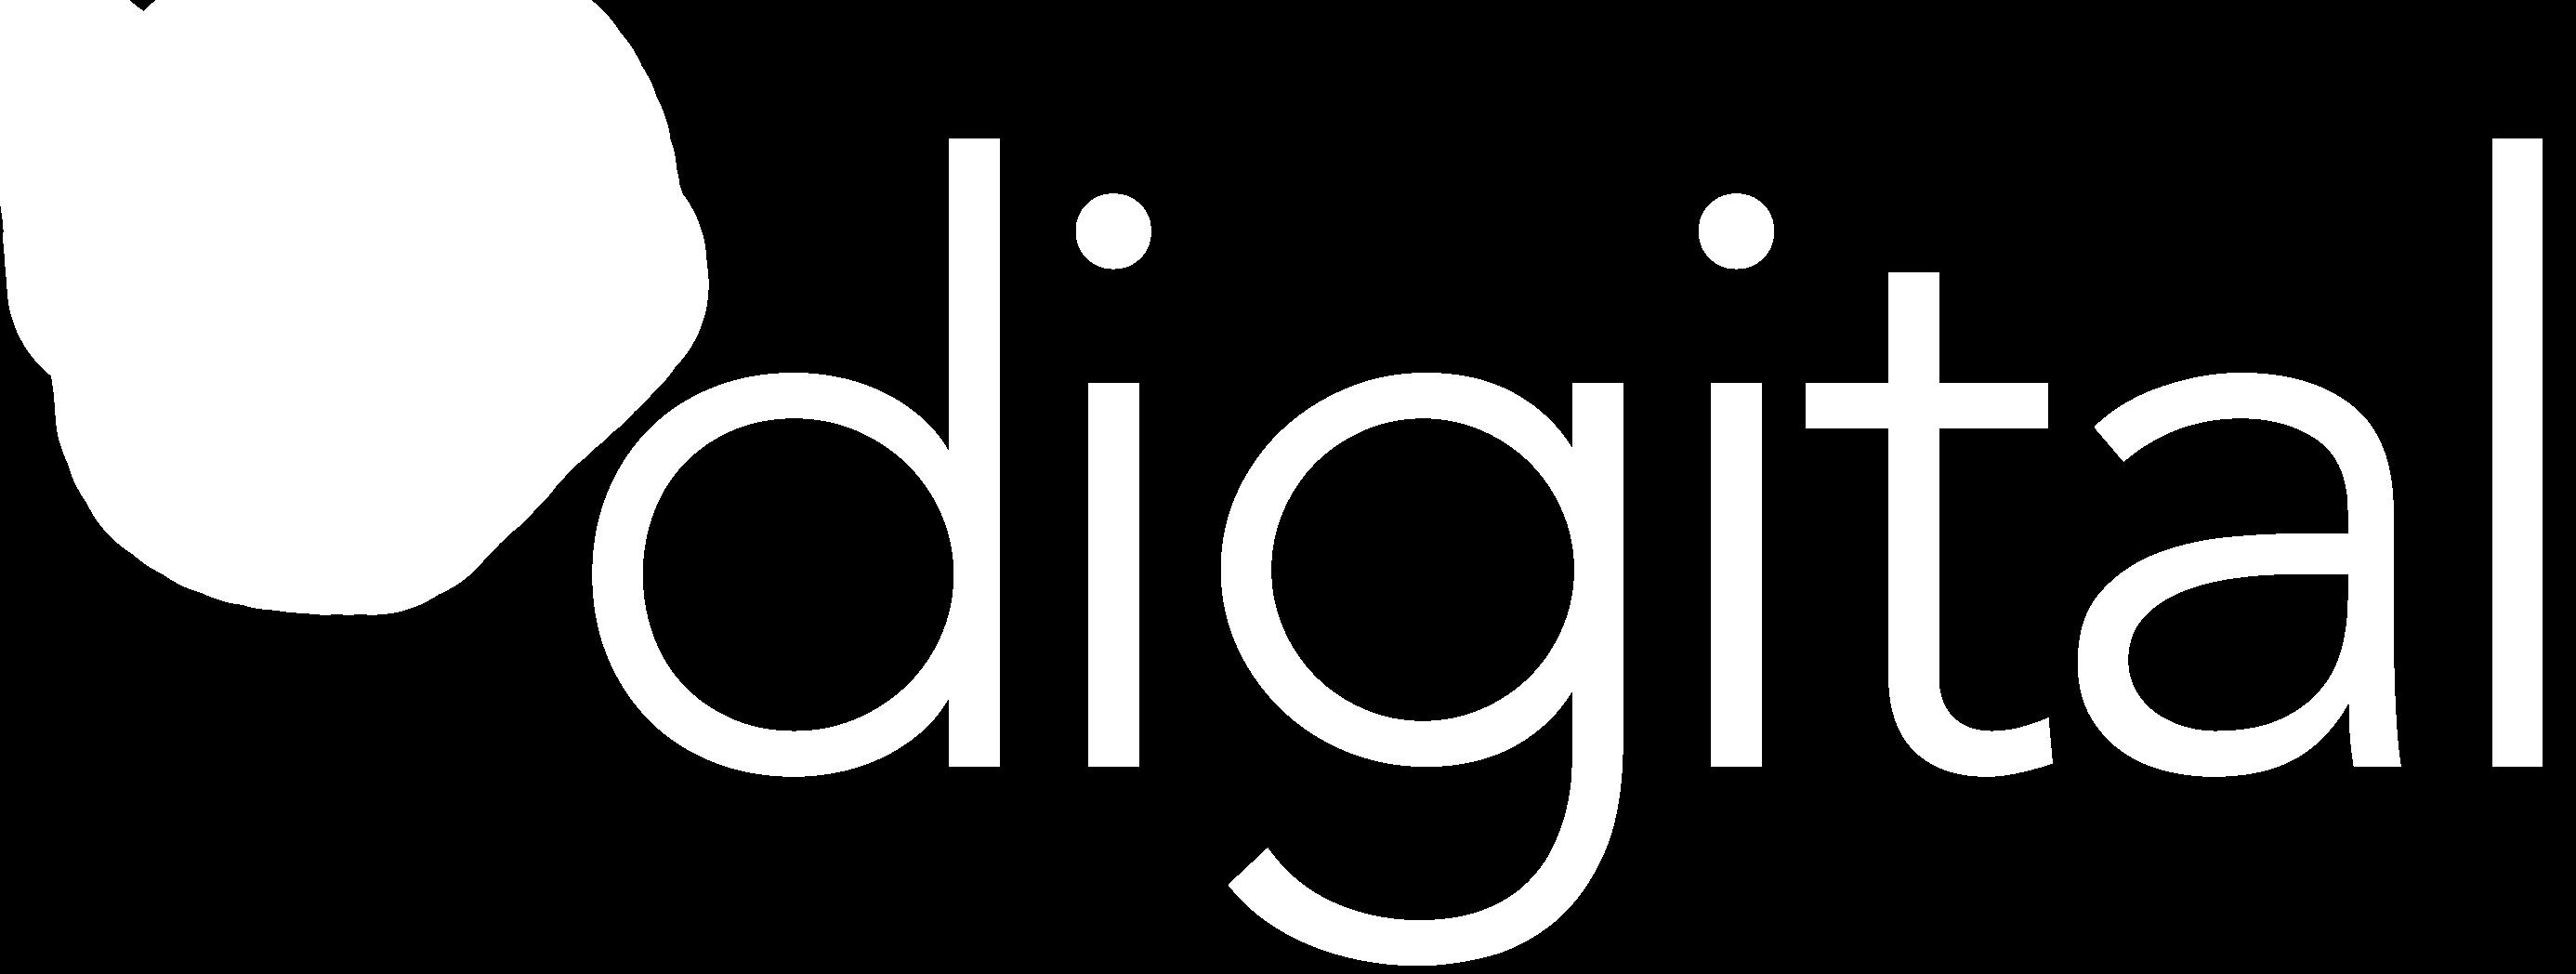 vh digital